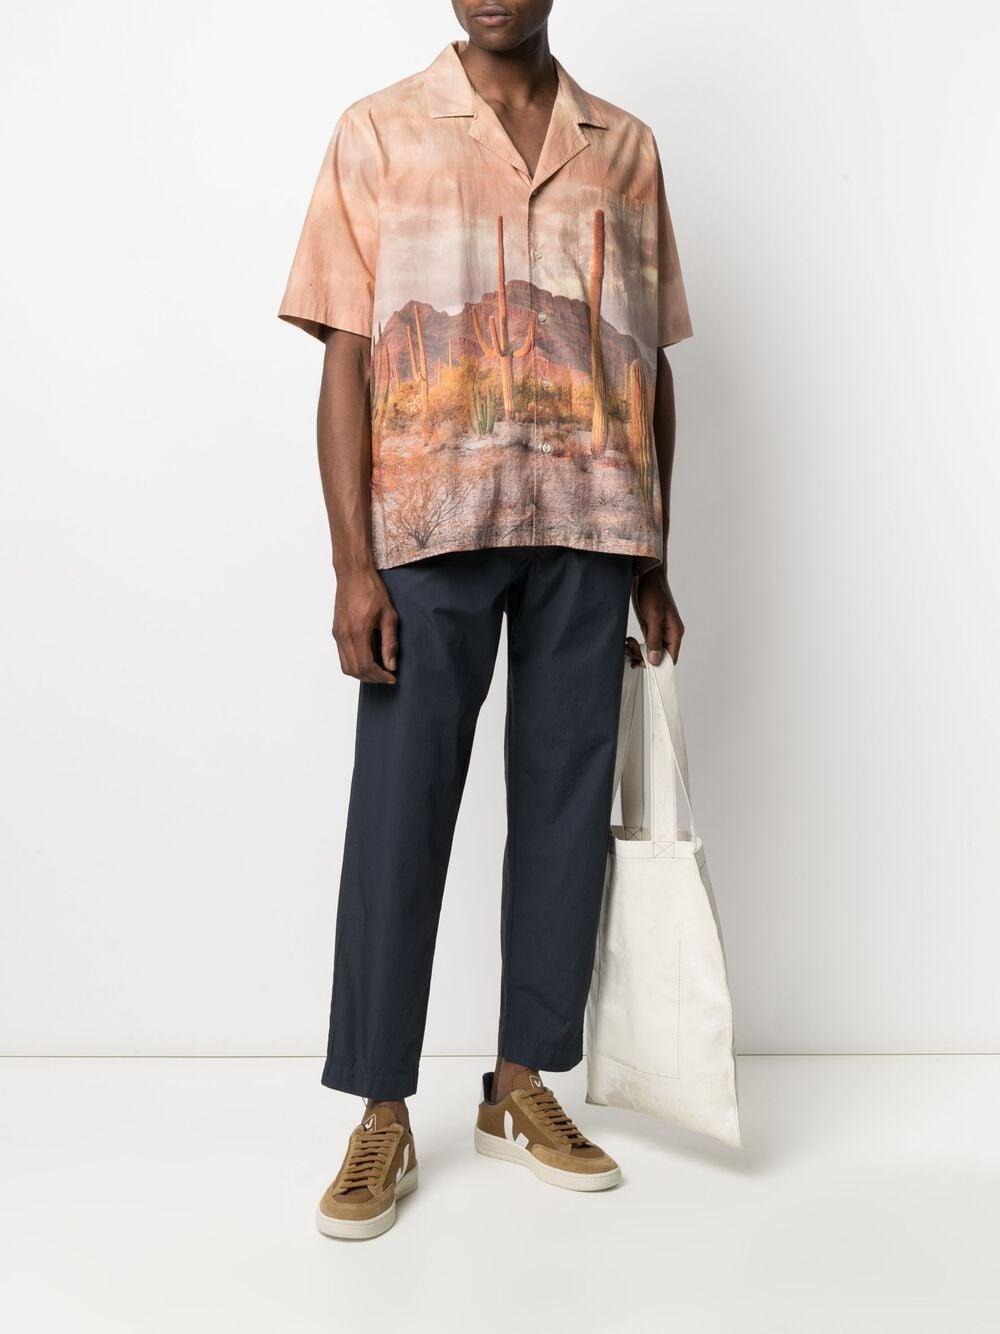 Navy blue cotton drawstring-waist tapered trousers  TRANSIT |  | CFUTRN-B111U05